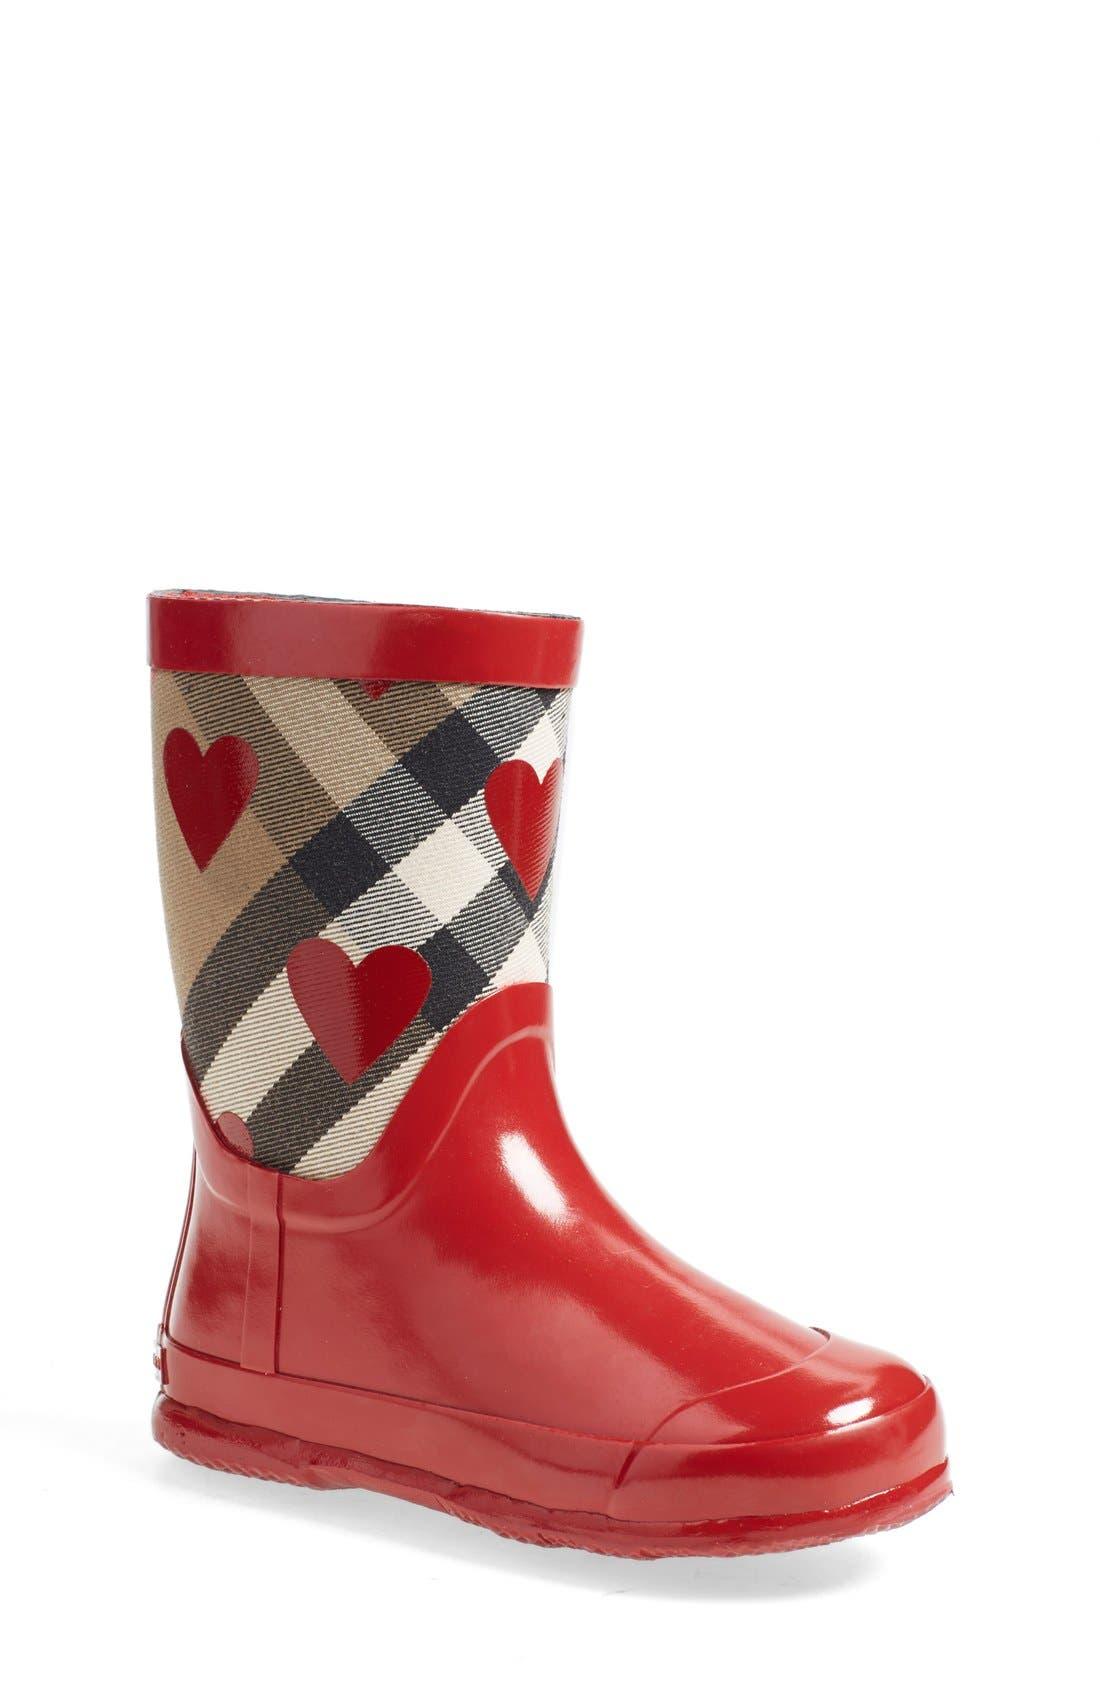 'Ranmoor' Heart Print Rain Boot, Main, color, 608